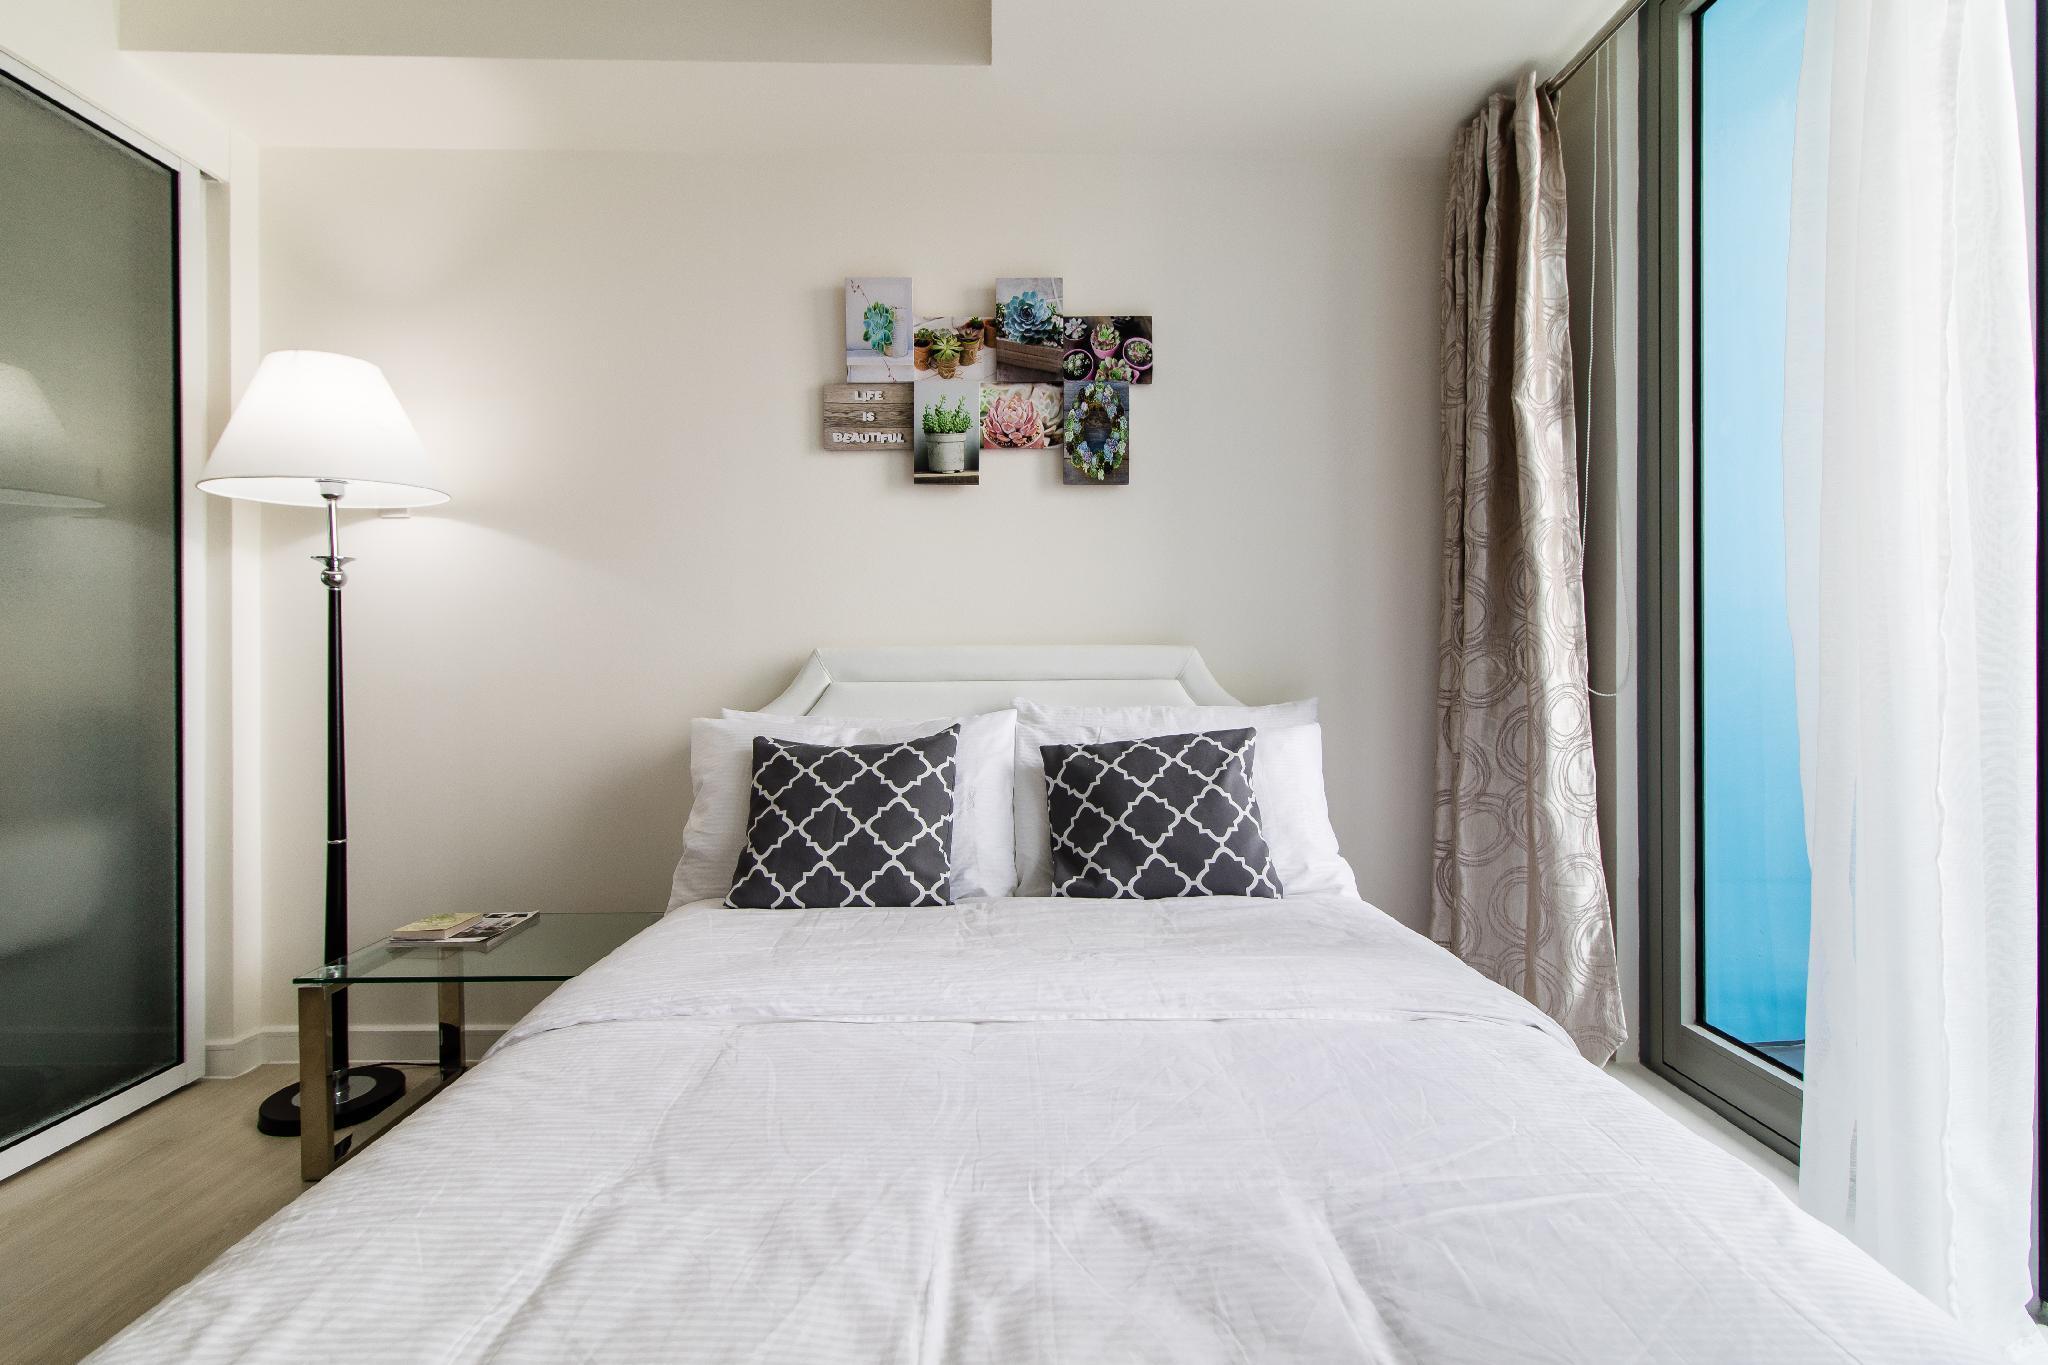 Bor 1412 Cheri @ Azure Urban Resort Residences